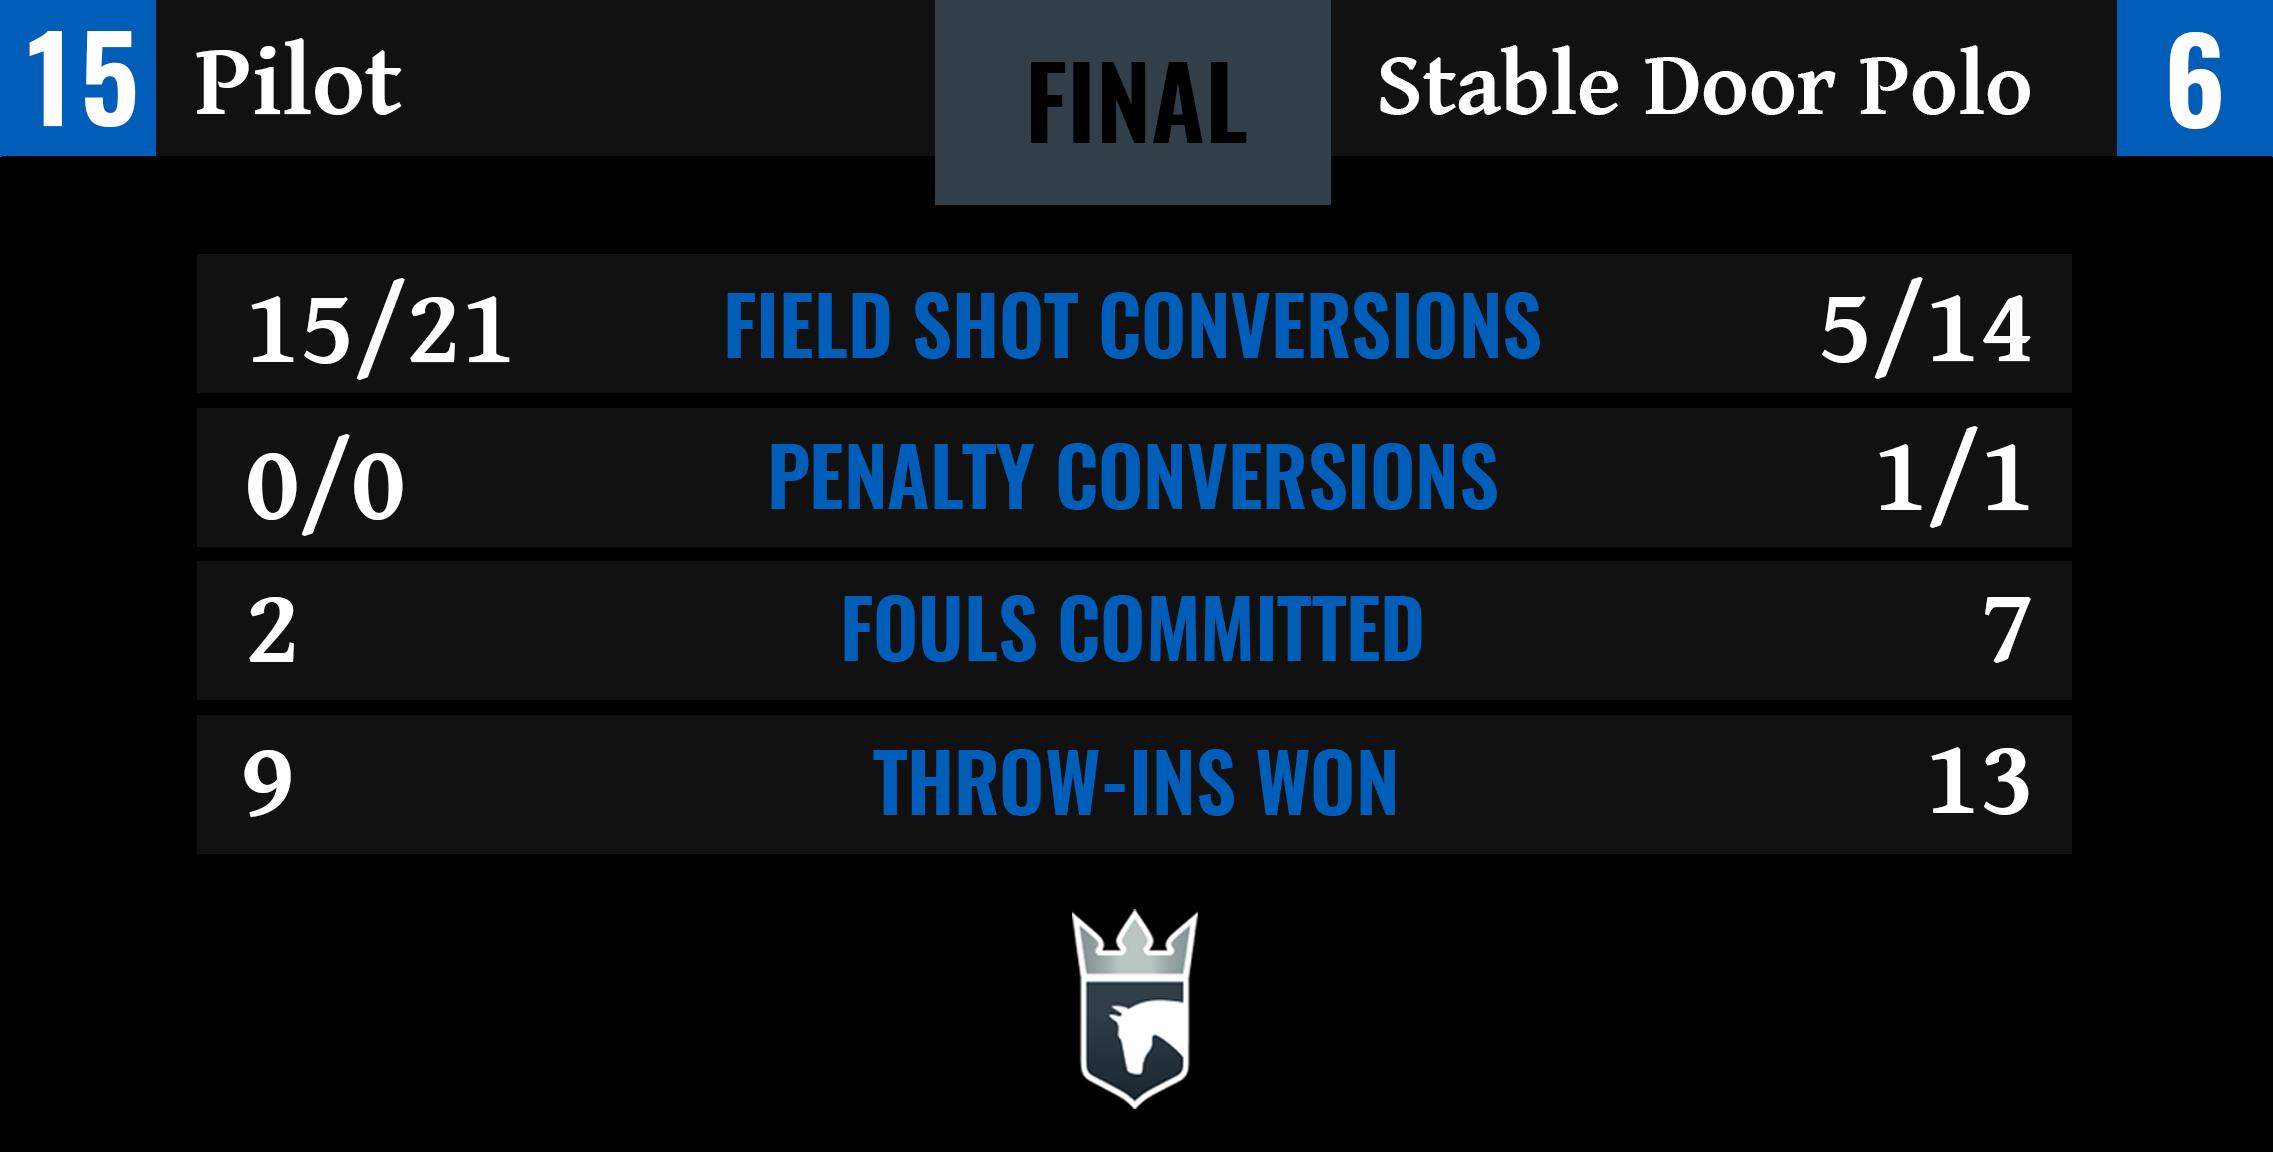 Pilot vs Stable Door Polo Final Stats